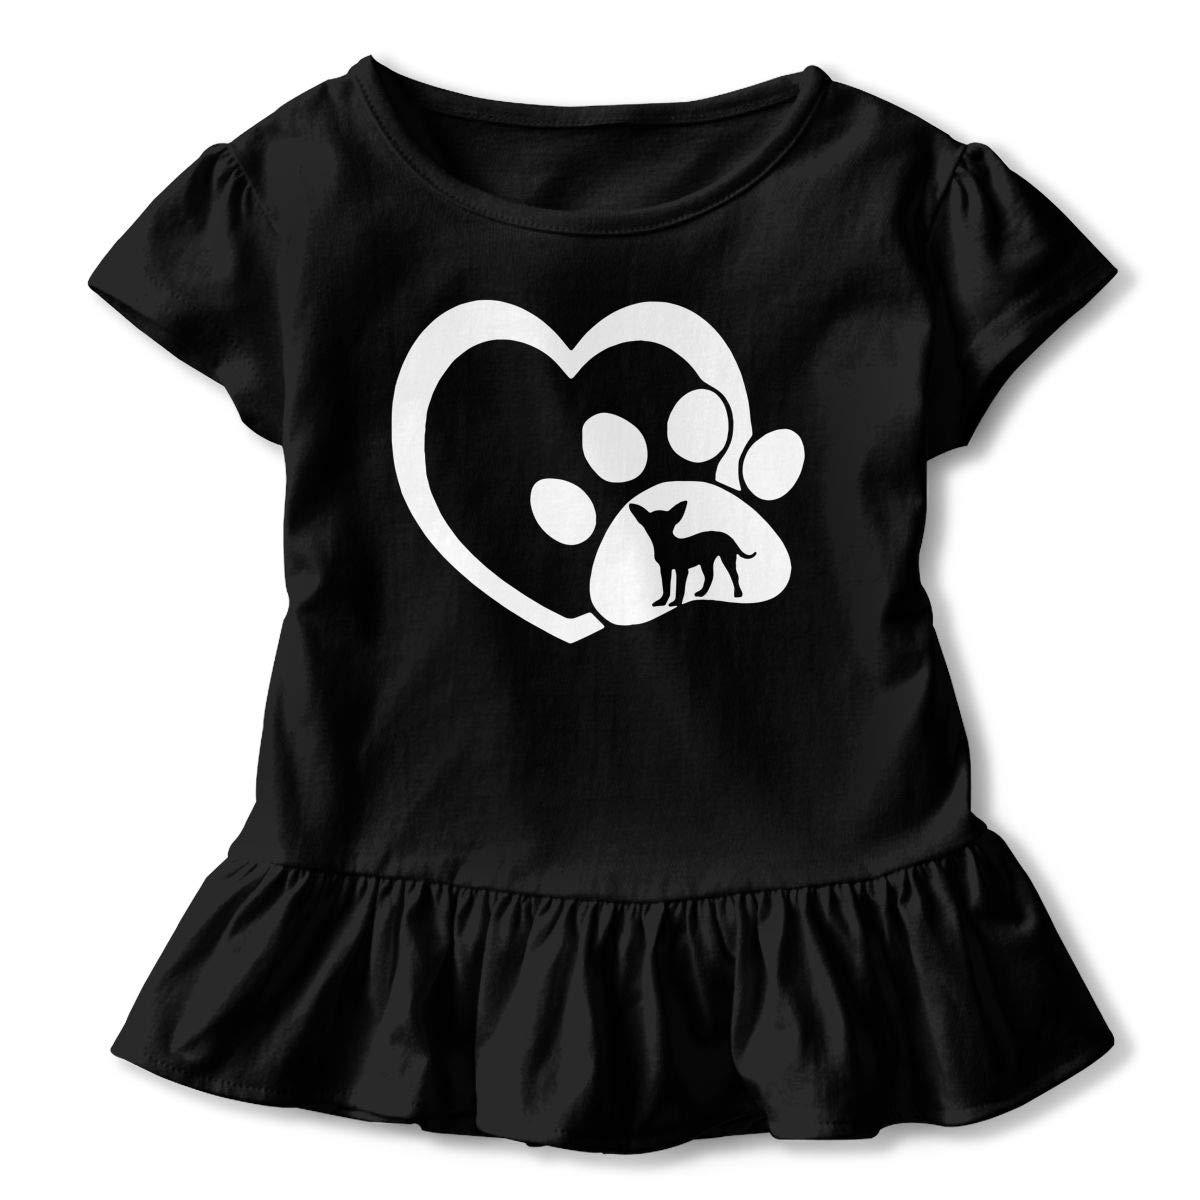 Dog Heartbeat Chihuahua Childrens Girls Short Sleeve Ruffles Shirt T-Shirt for 2-6 Toddlers